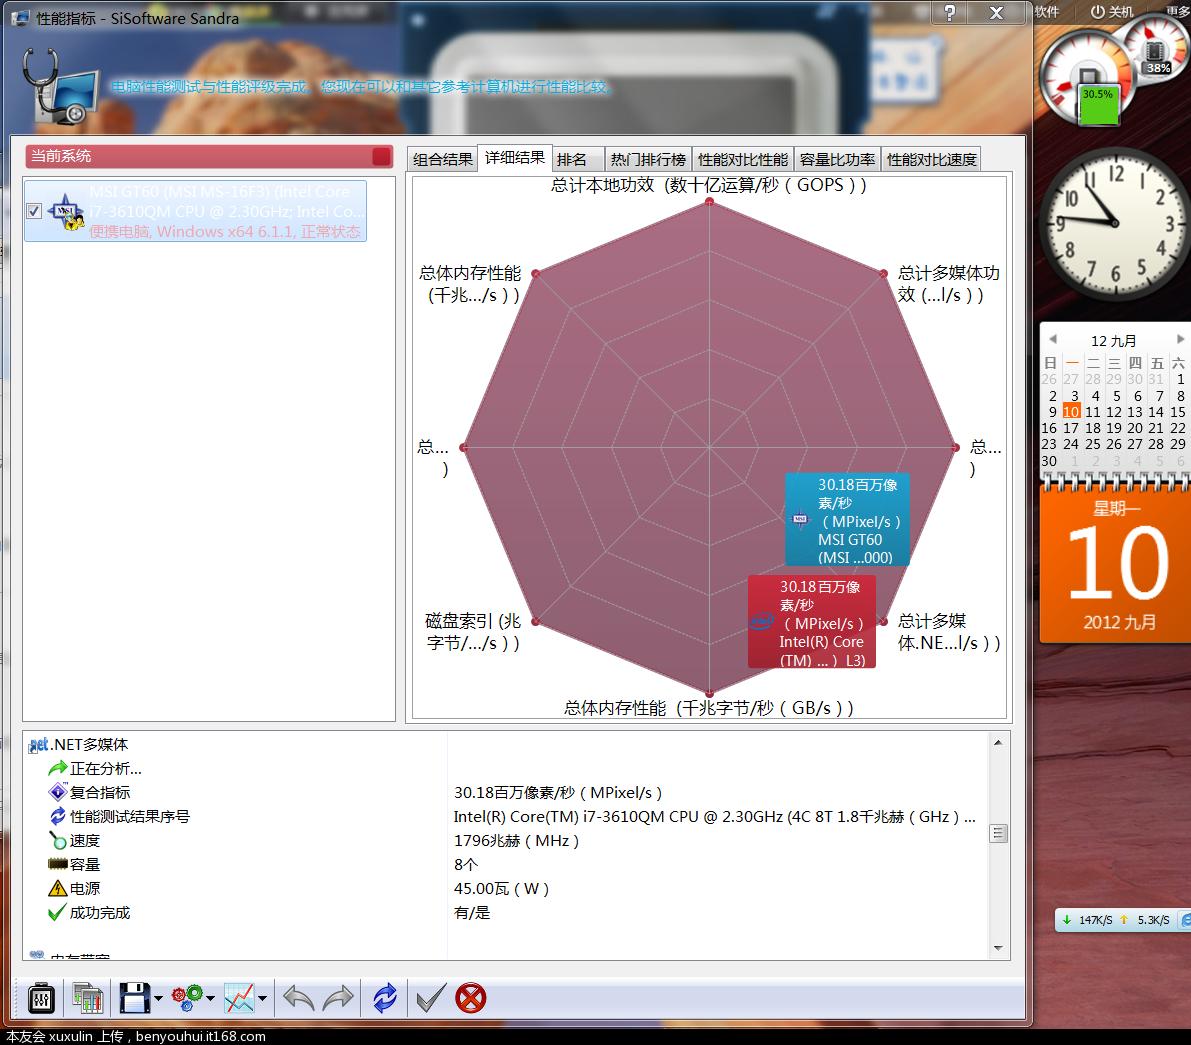 Sisoftware Sandra 截图6.PNG